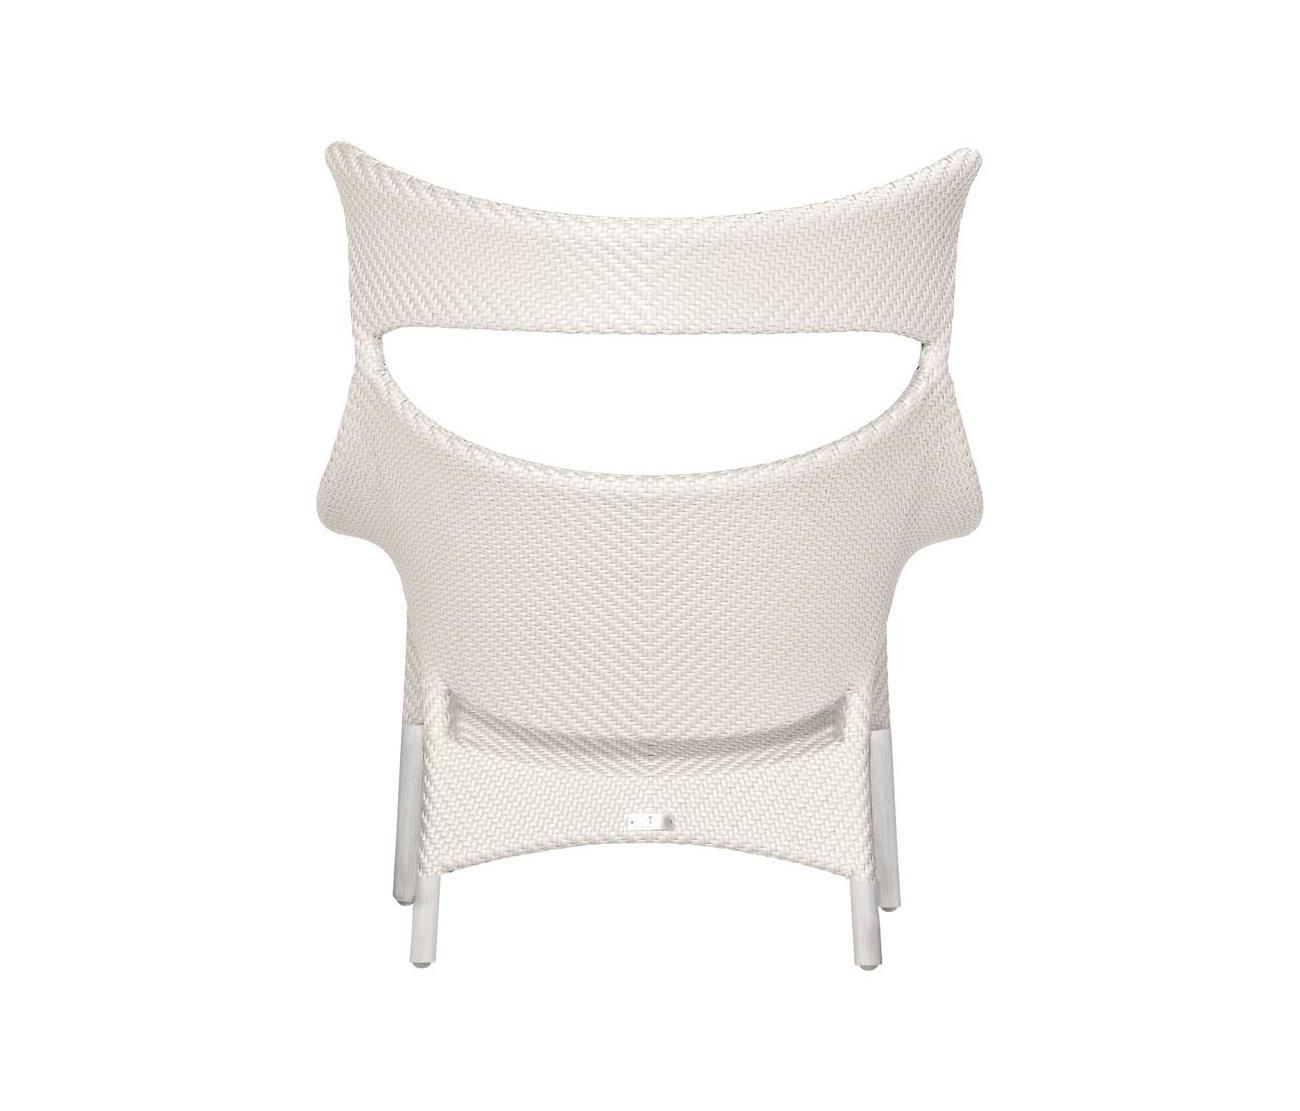 Amari Rattan High Back Lounge Chair Armchairs From Janus